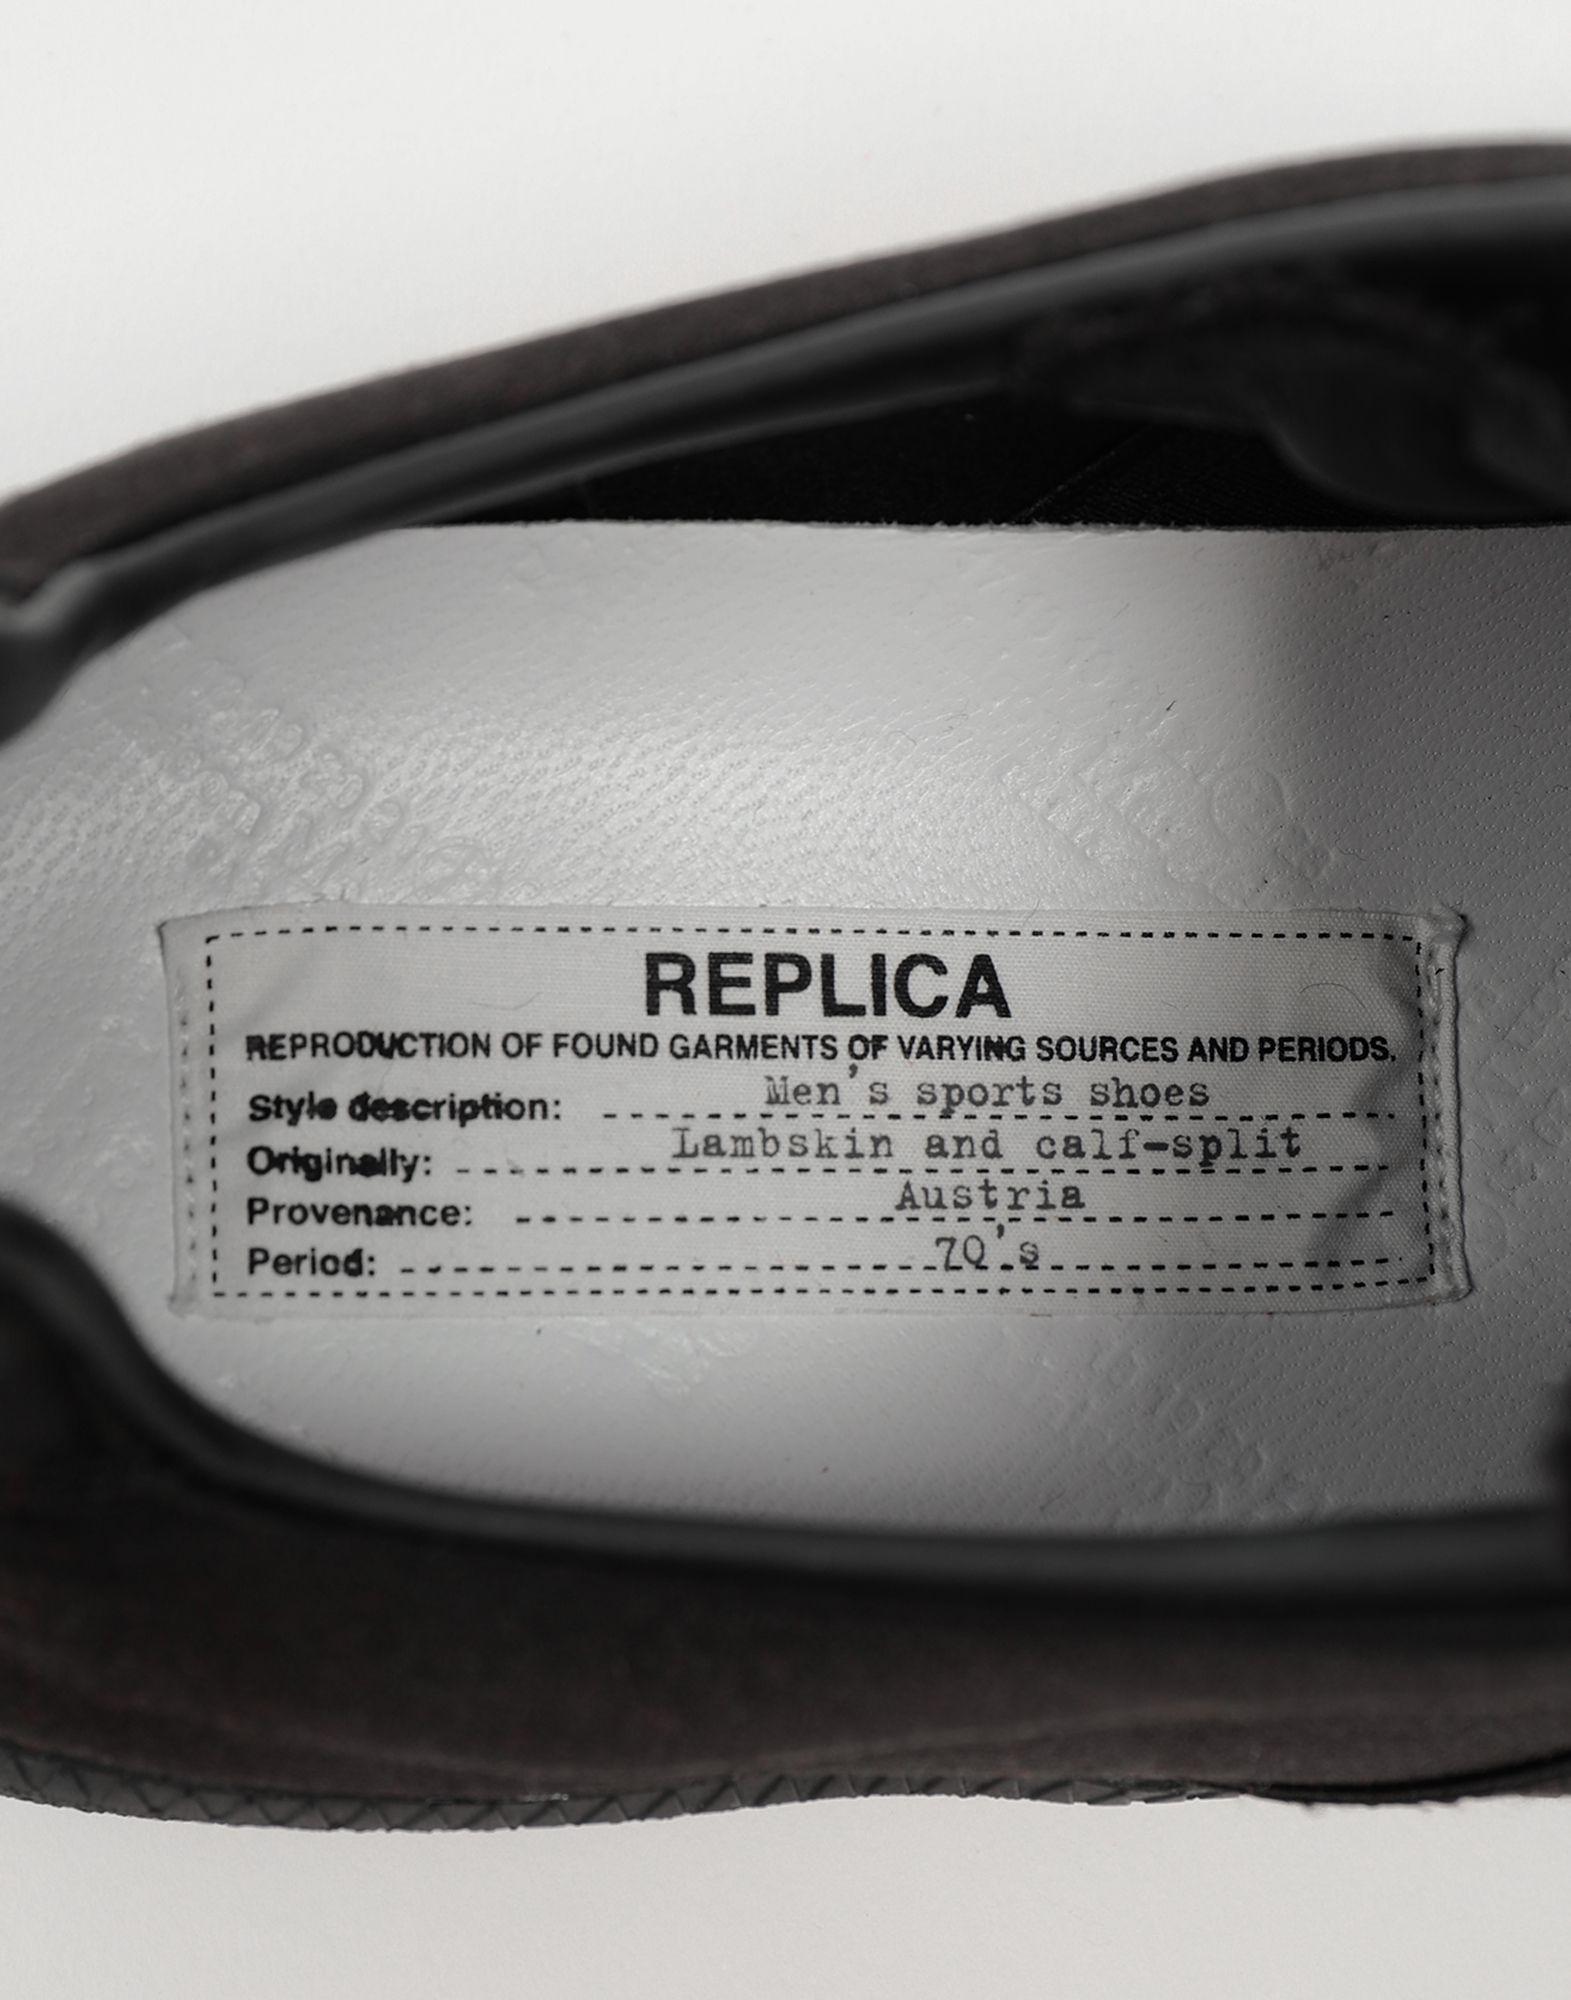 9f1cf7835888 Lyst - Maison Margiela Replica Low Top Satin Sneakers in Black for Men